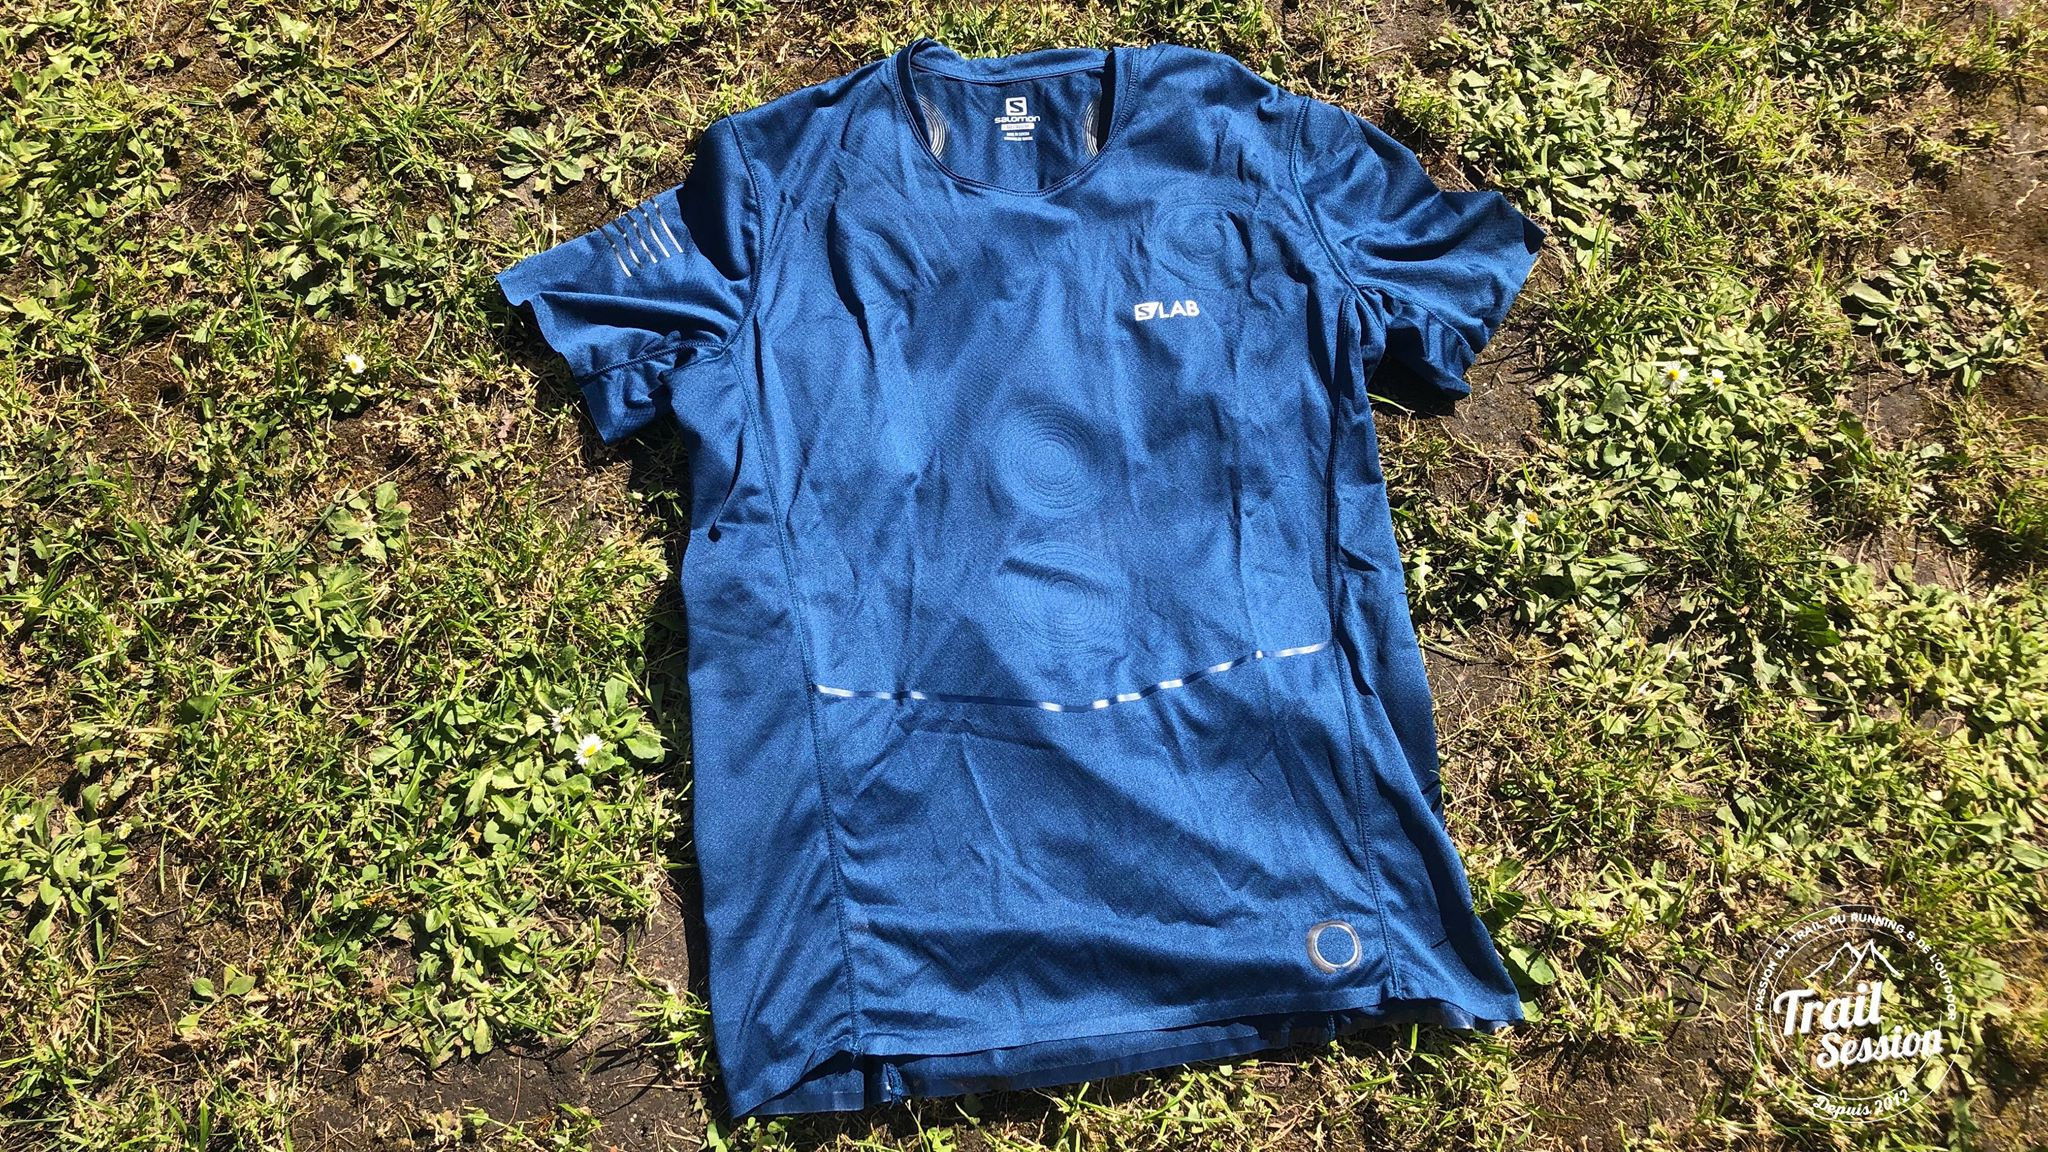 S-Lab T-Shirt NSO & Short 6 : Le t-shirt NSO